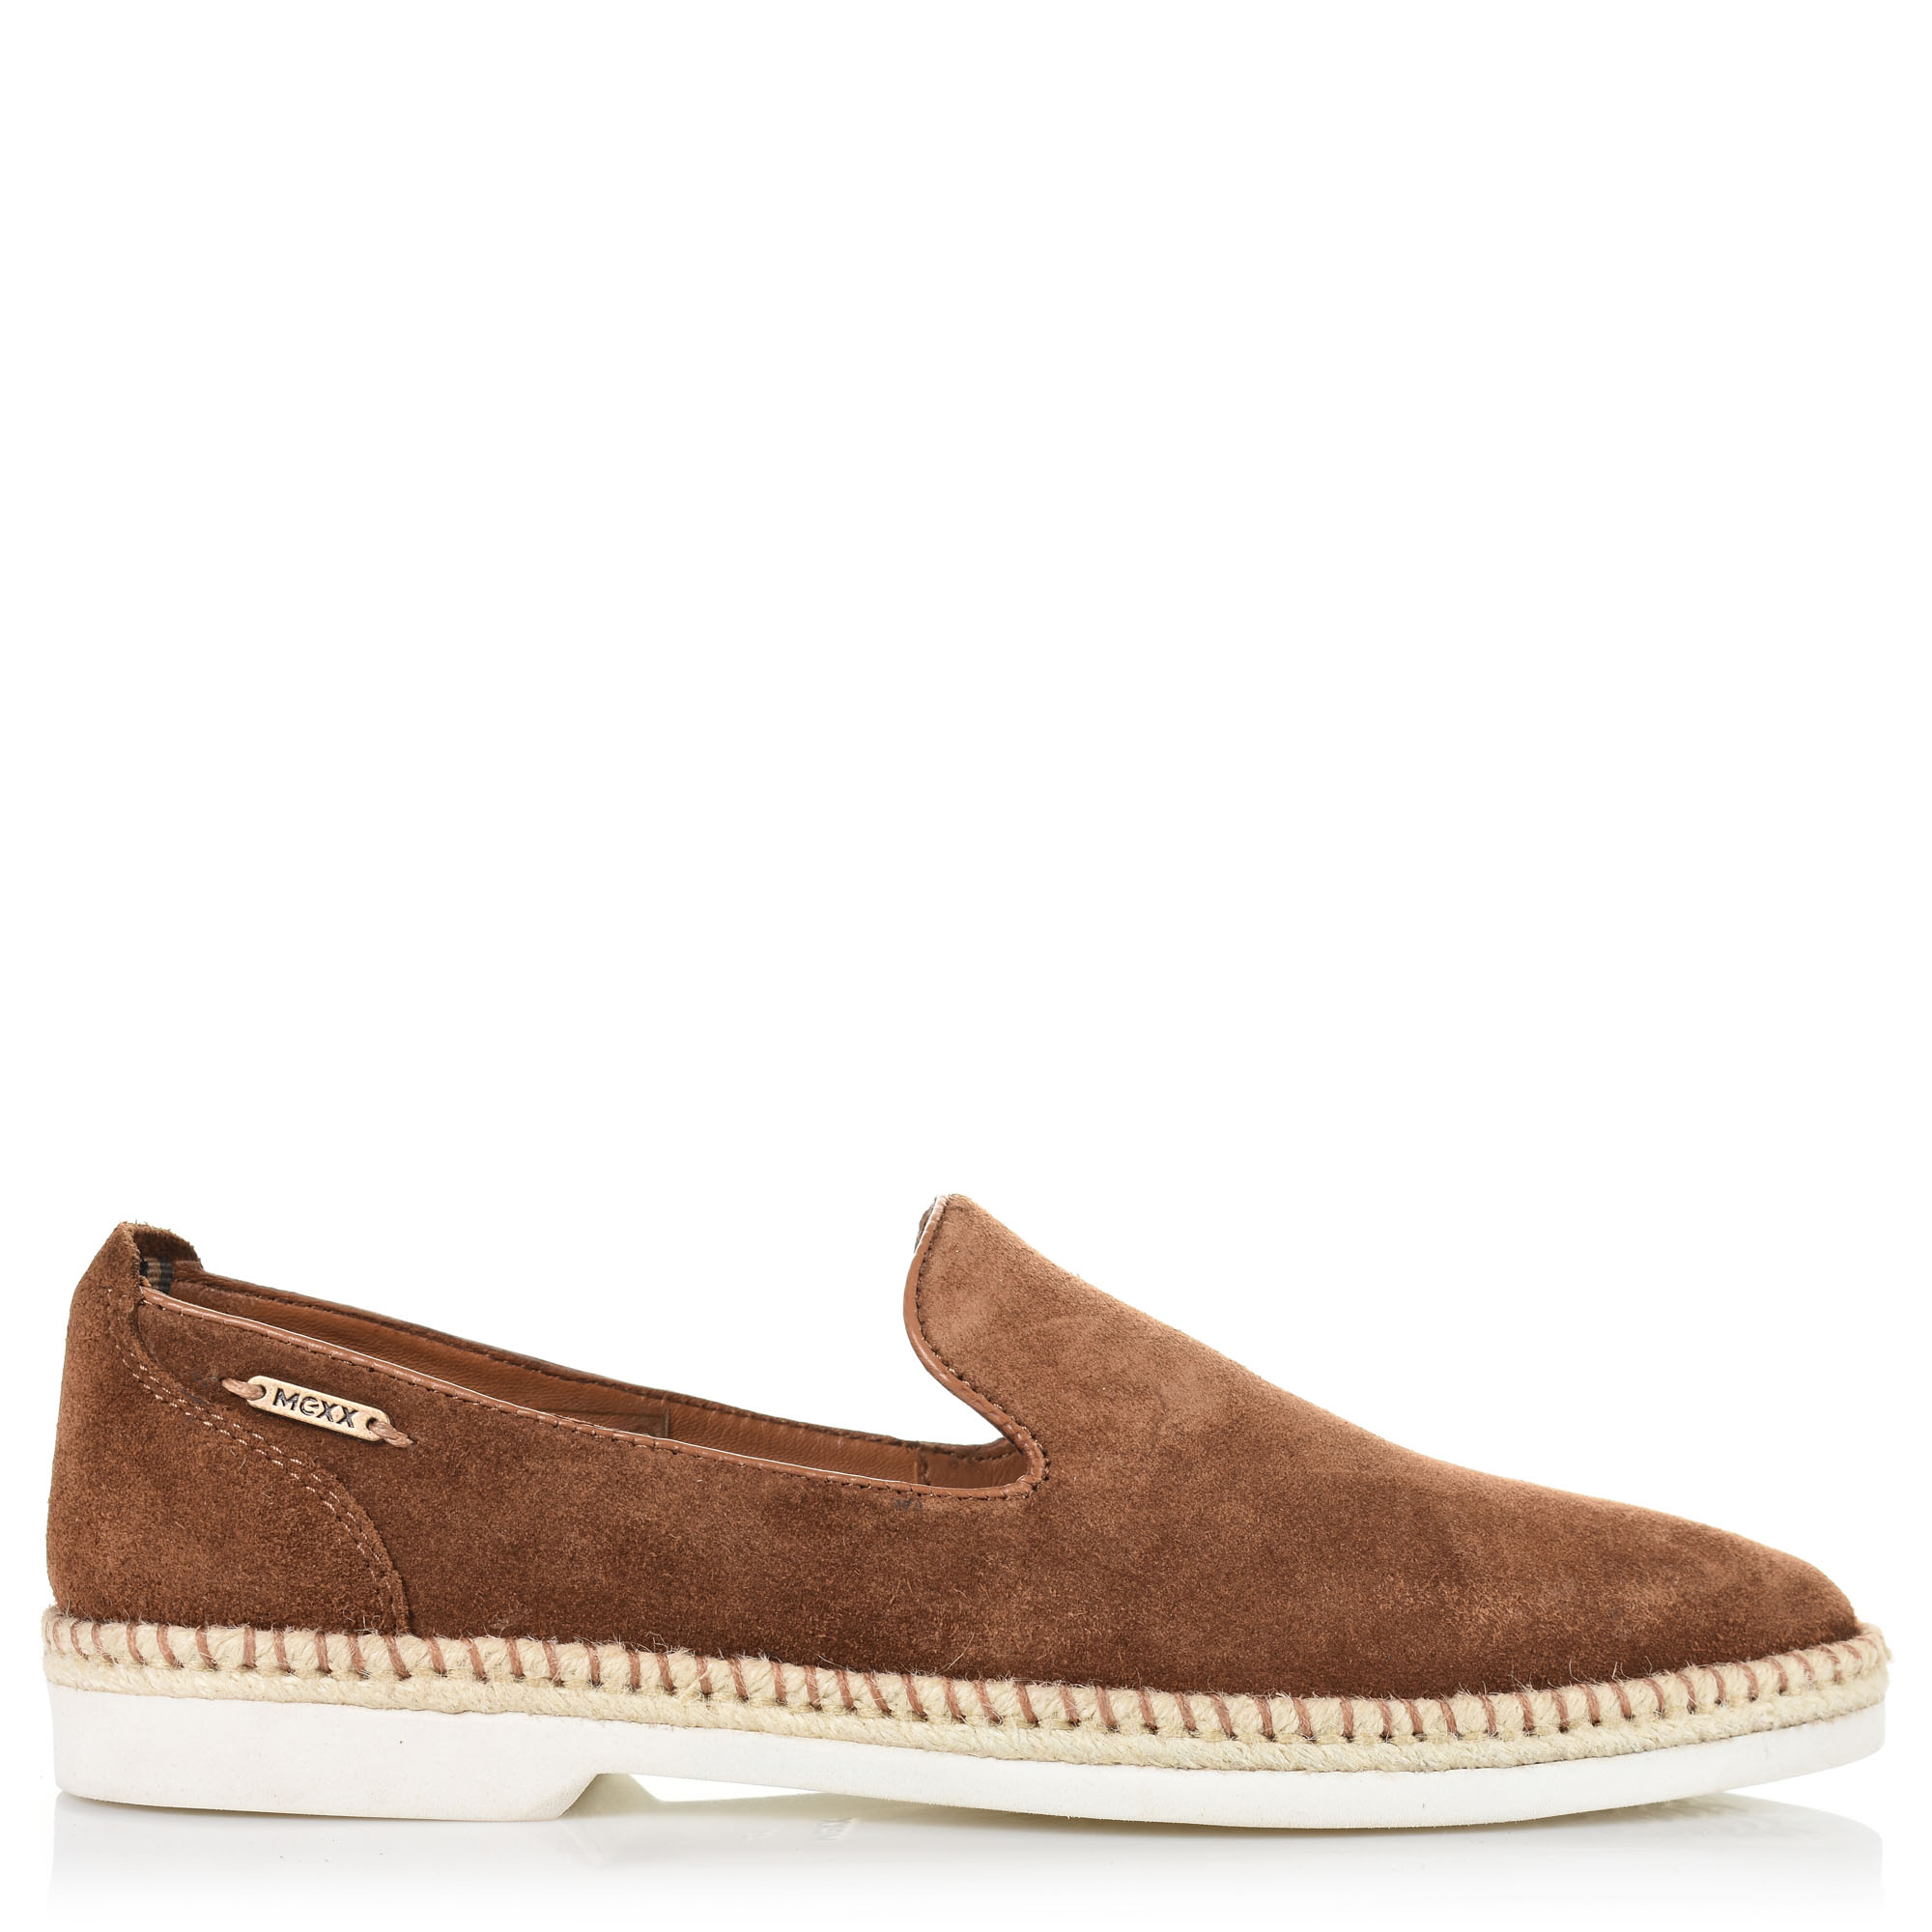 Suede Δερμάτινες Εσπαντρίγιες Mexx Loafer Calvin MXDA0033 ανδρας   ανδρικό παπούτσι